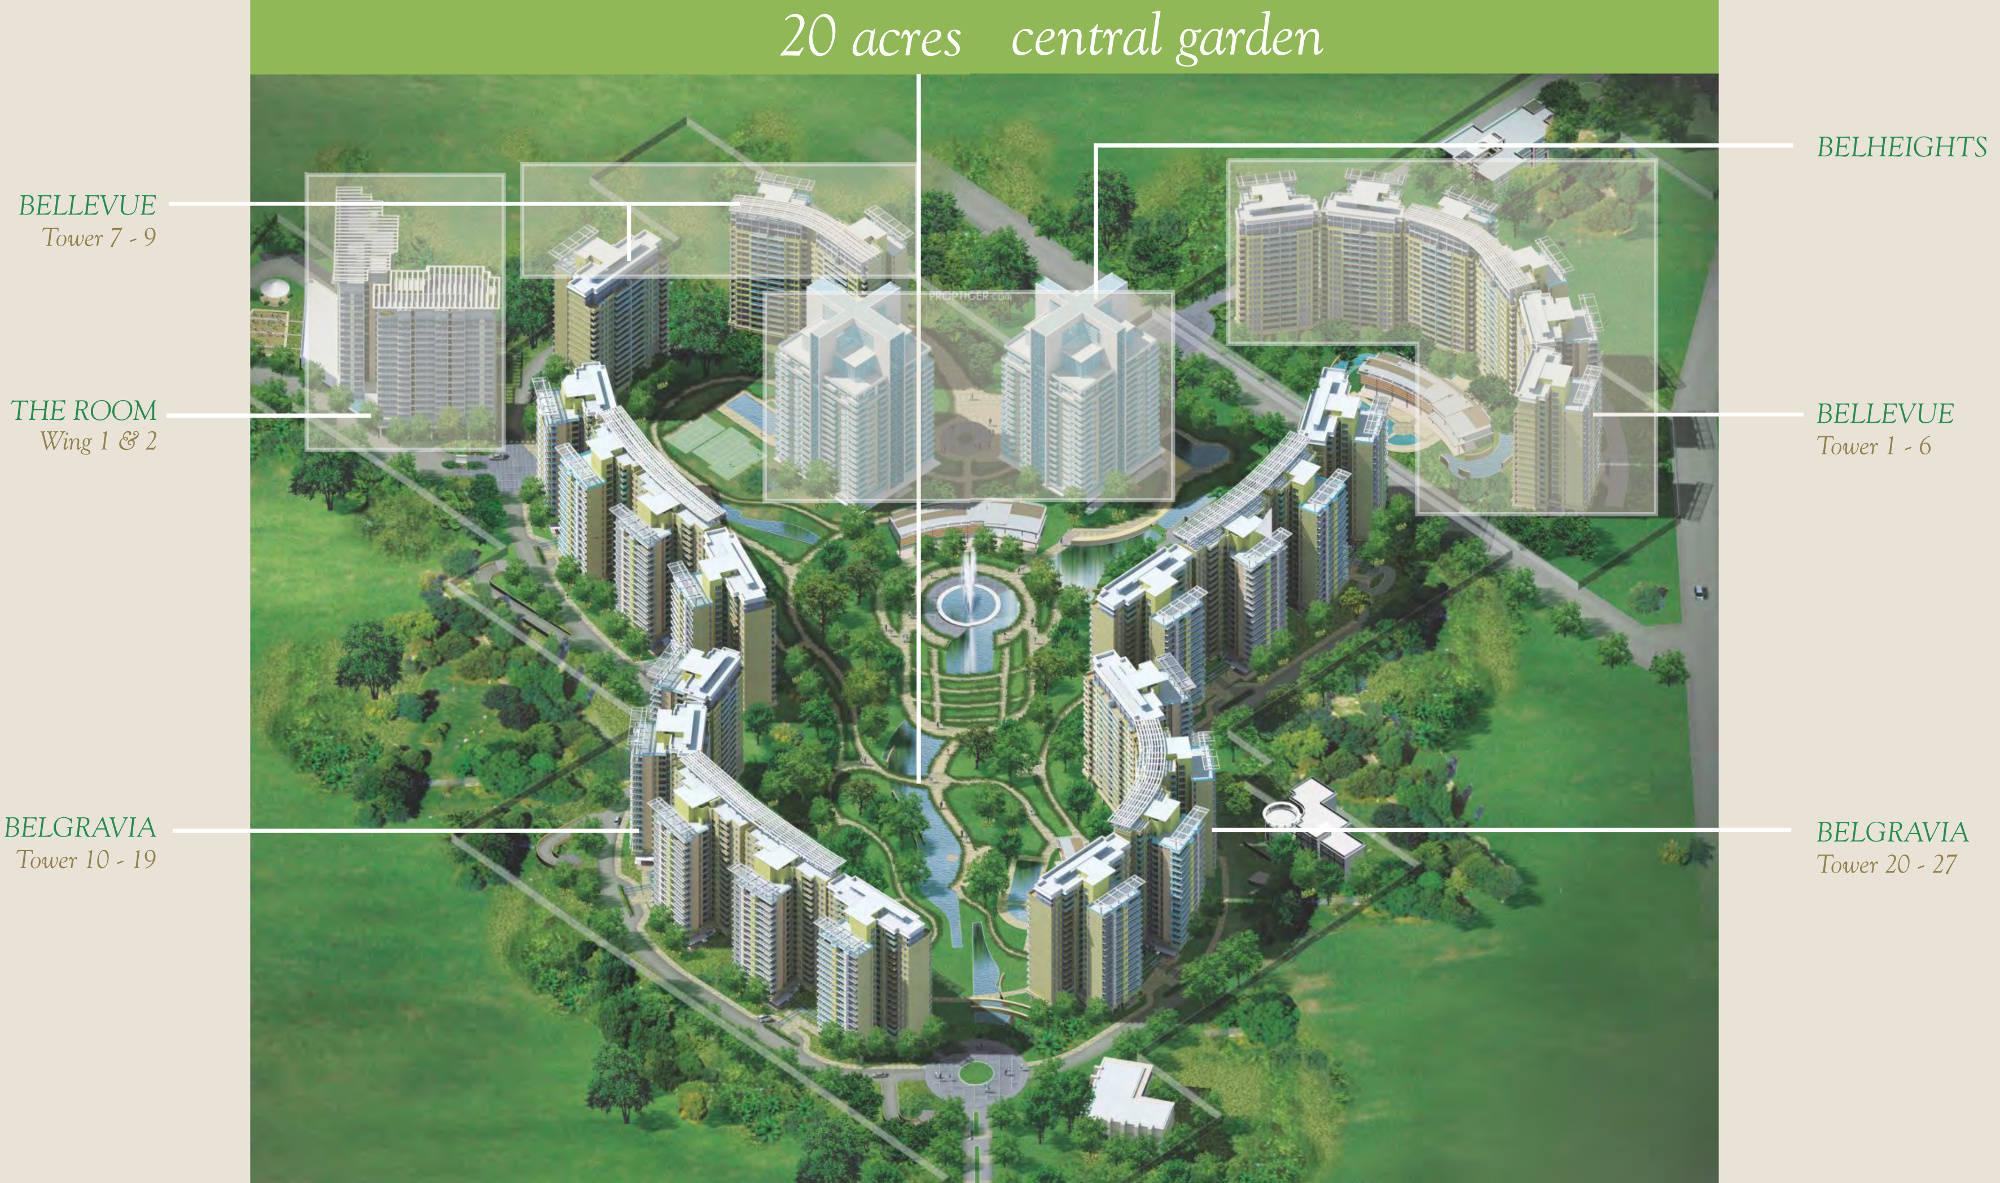 Resort Elevation Plan : Sq ft bhk floor plan image central park belgravia